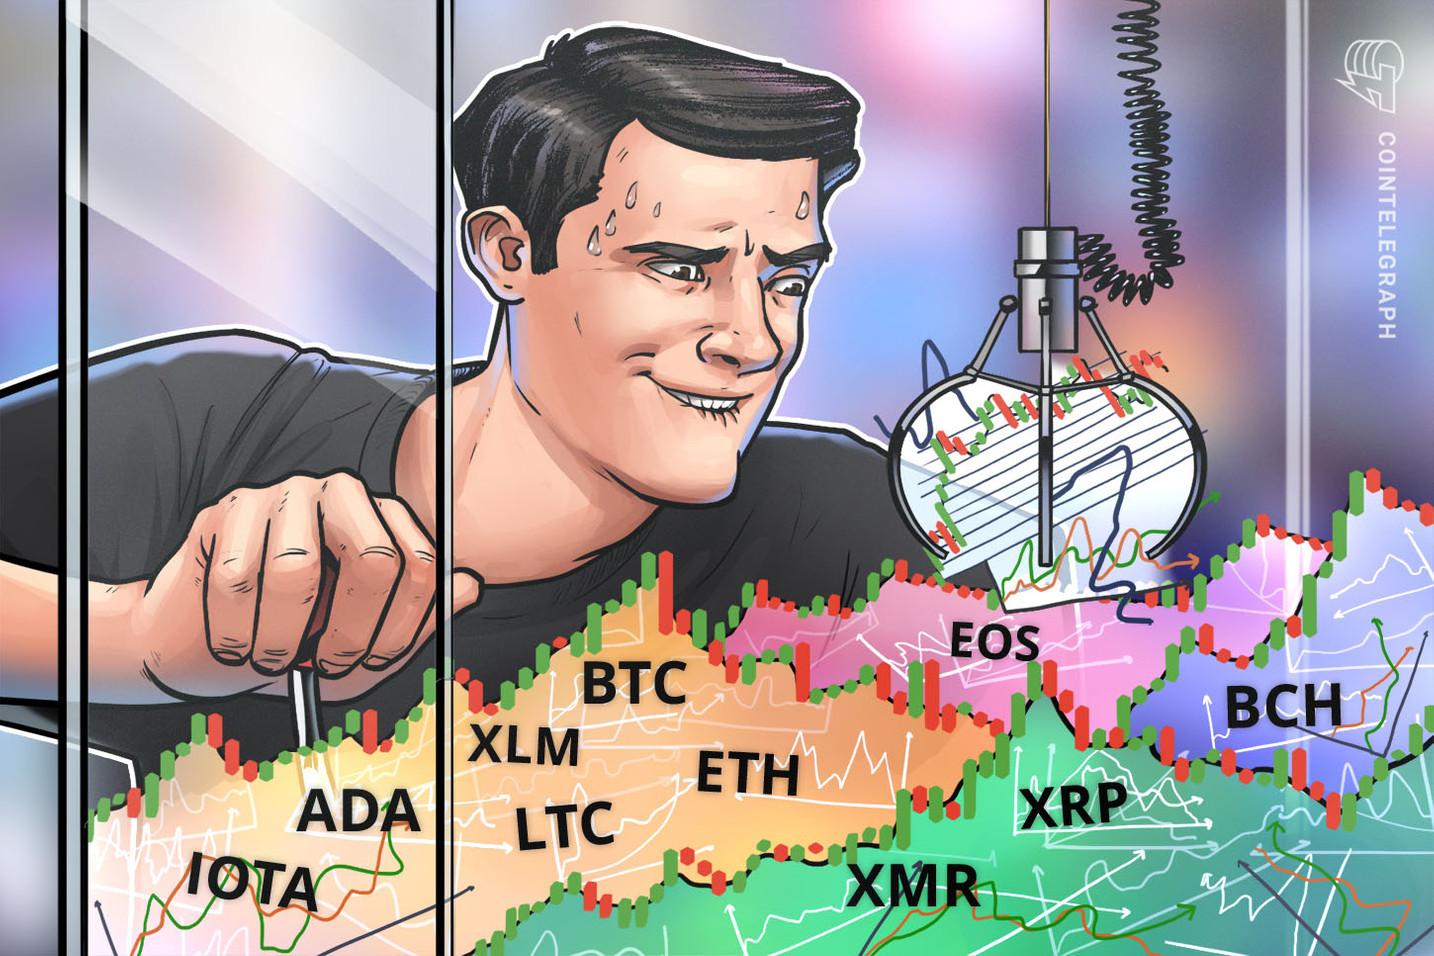 Bitcoin, Ethereum, Ripple, Bitcoin Cash, EOS, Stellar, Litecoin, Cardano, Monero, Dash: Analisi dei prezzi, 1 ottobre